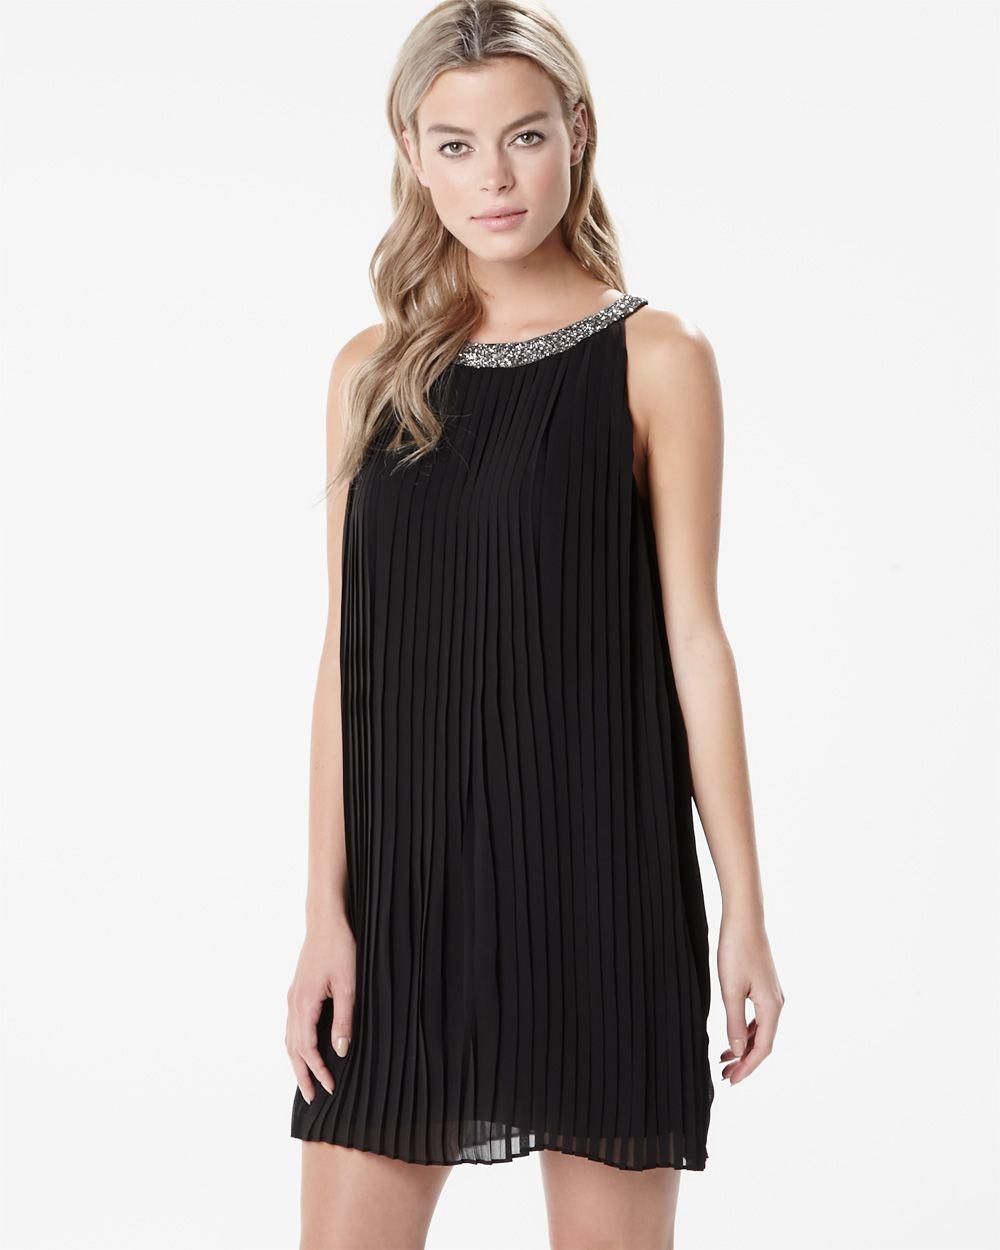 Jewel Embellished Collar Shift Dress - Just $6